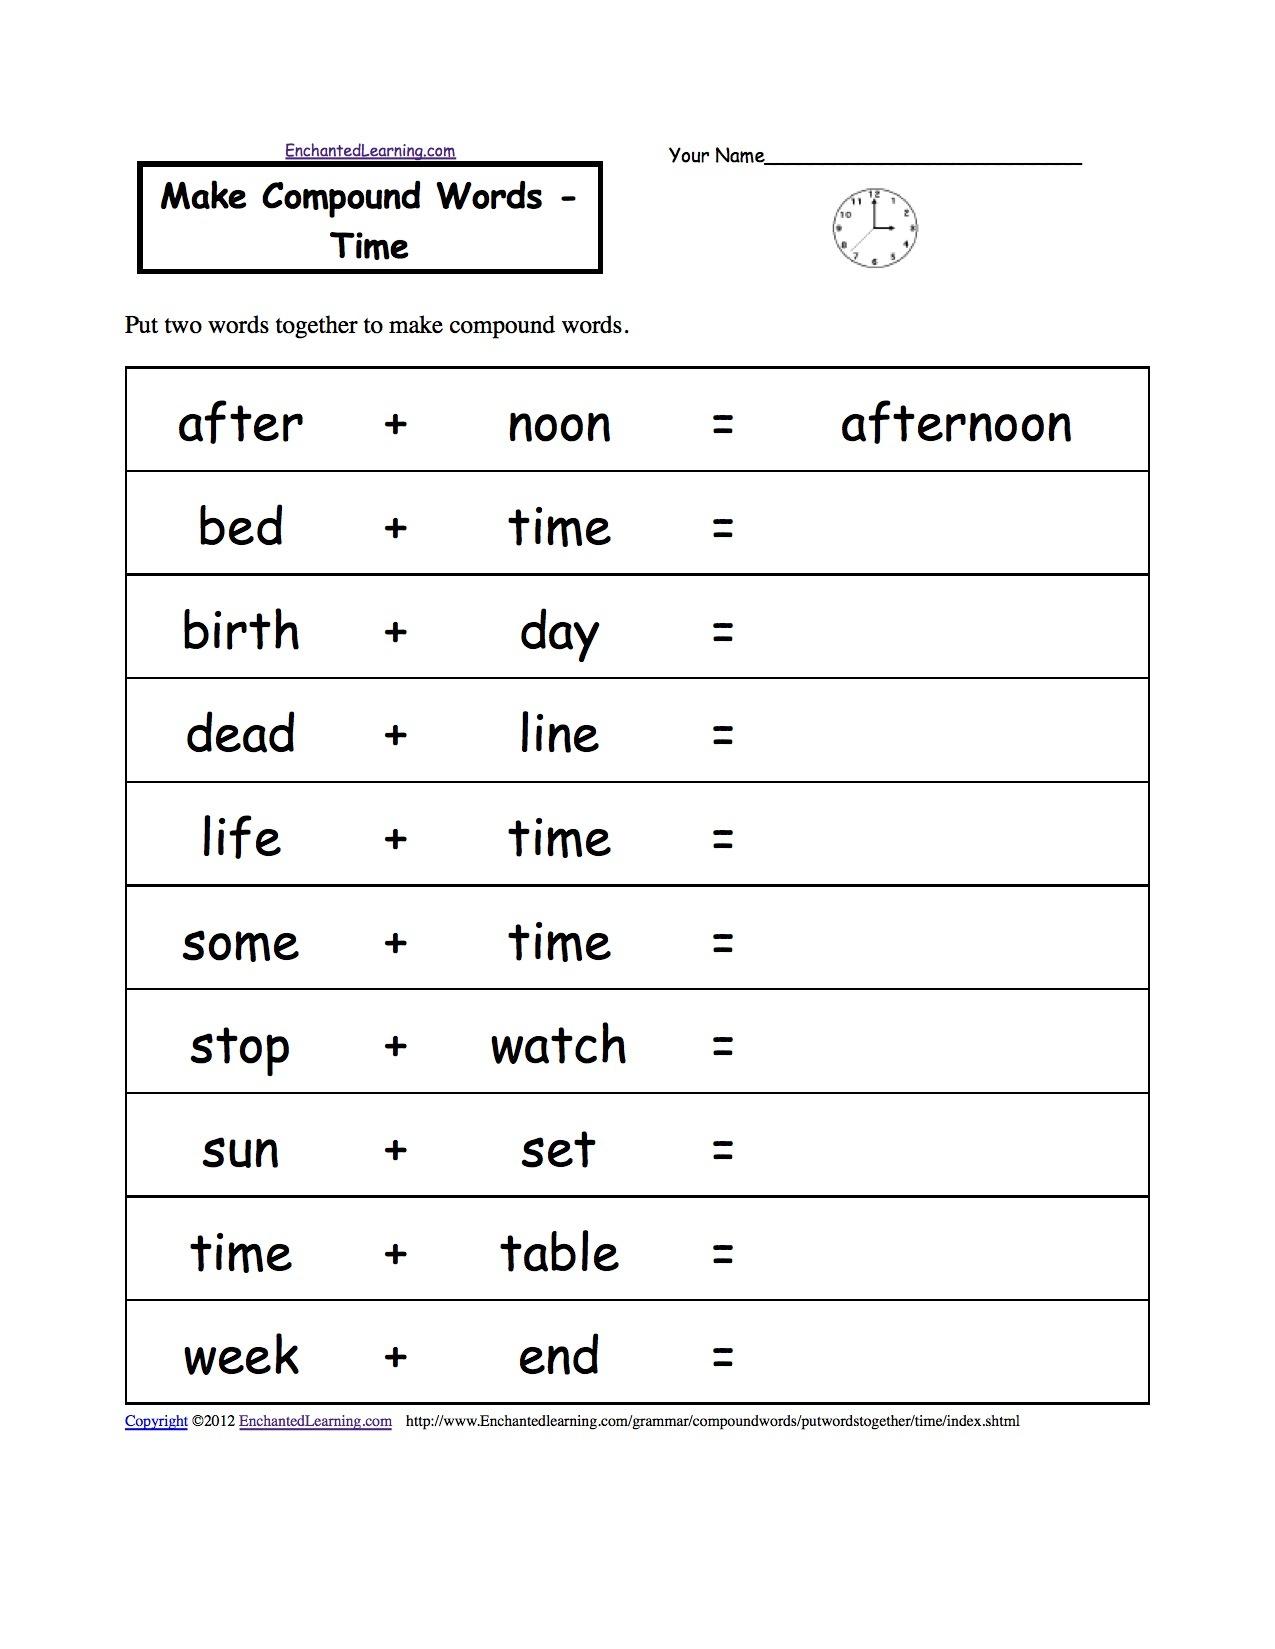 Ideas Of Free Printable Grammar Worksheets For 2Nd Grade - Free Printable Grammar Worksheets For 2Nd Grade